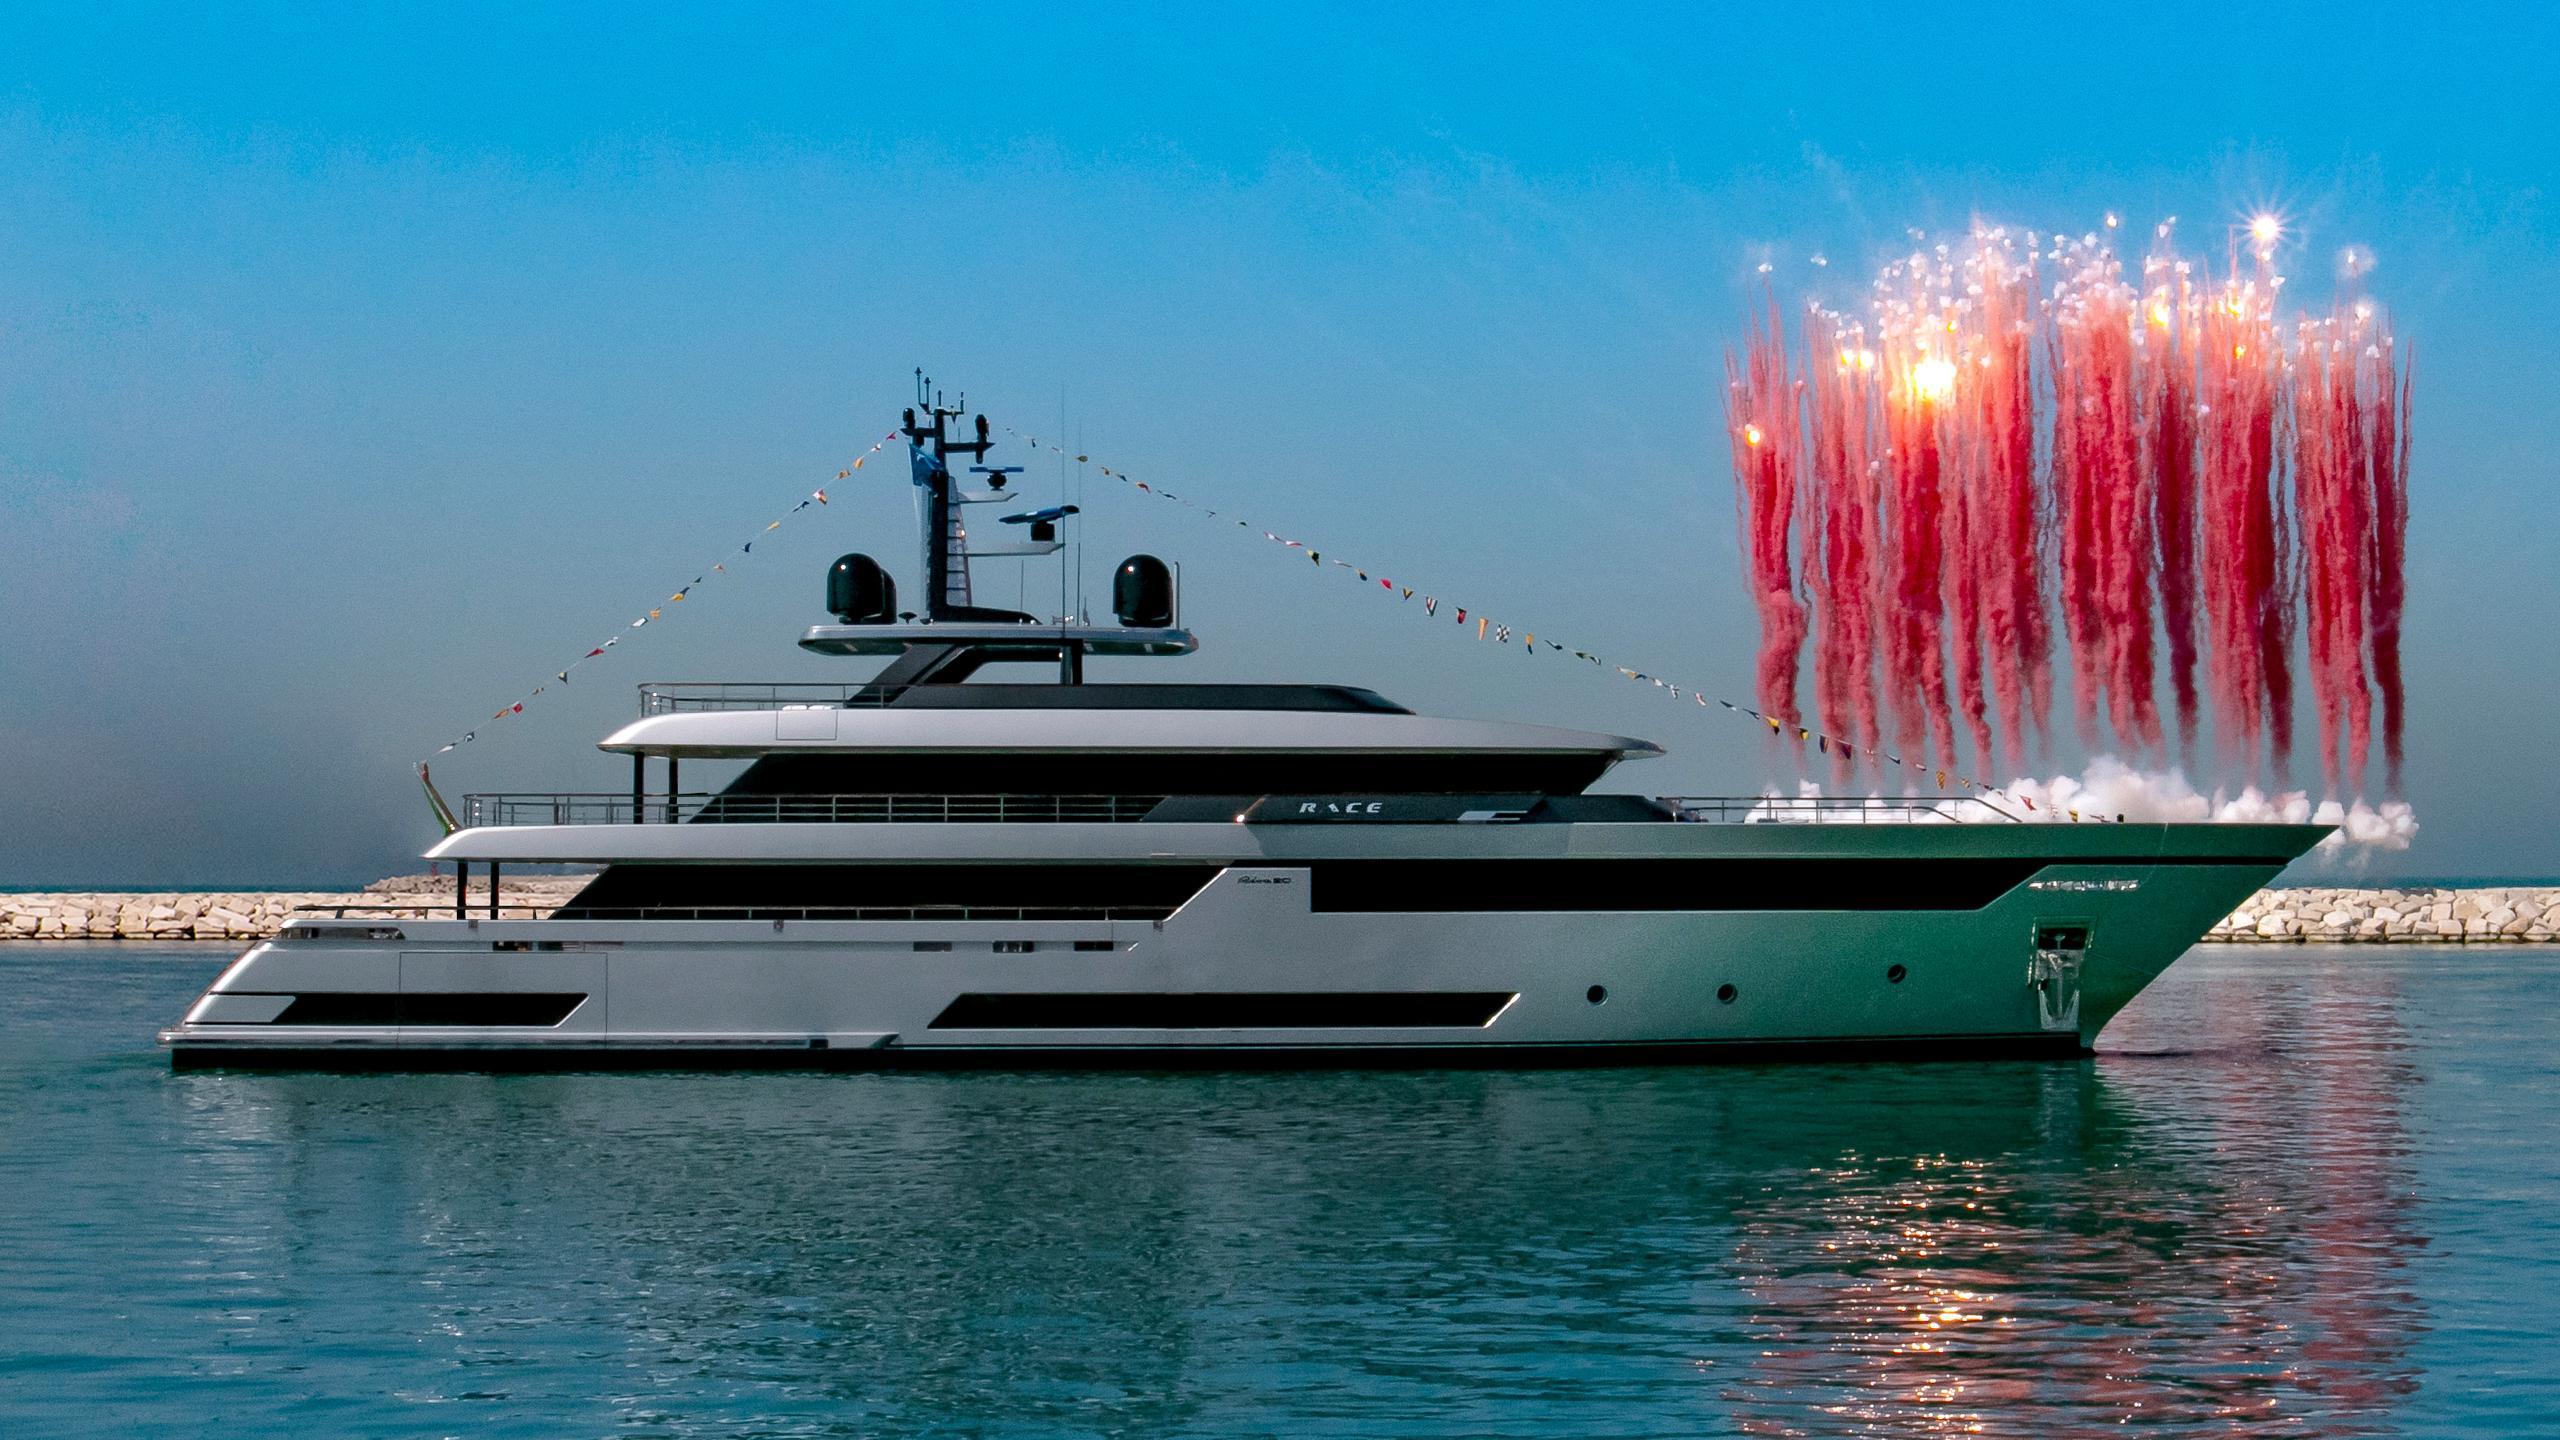 race motoryacht riva yachts 50m 2019 launch